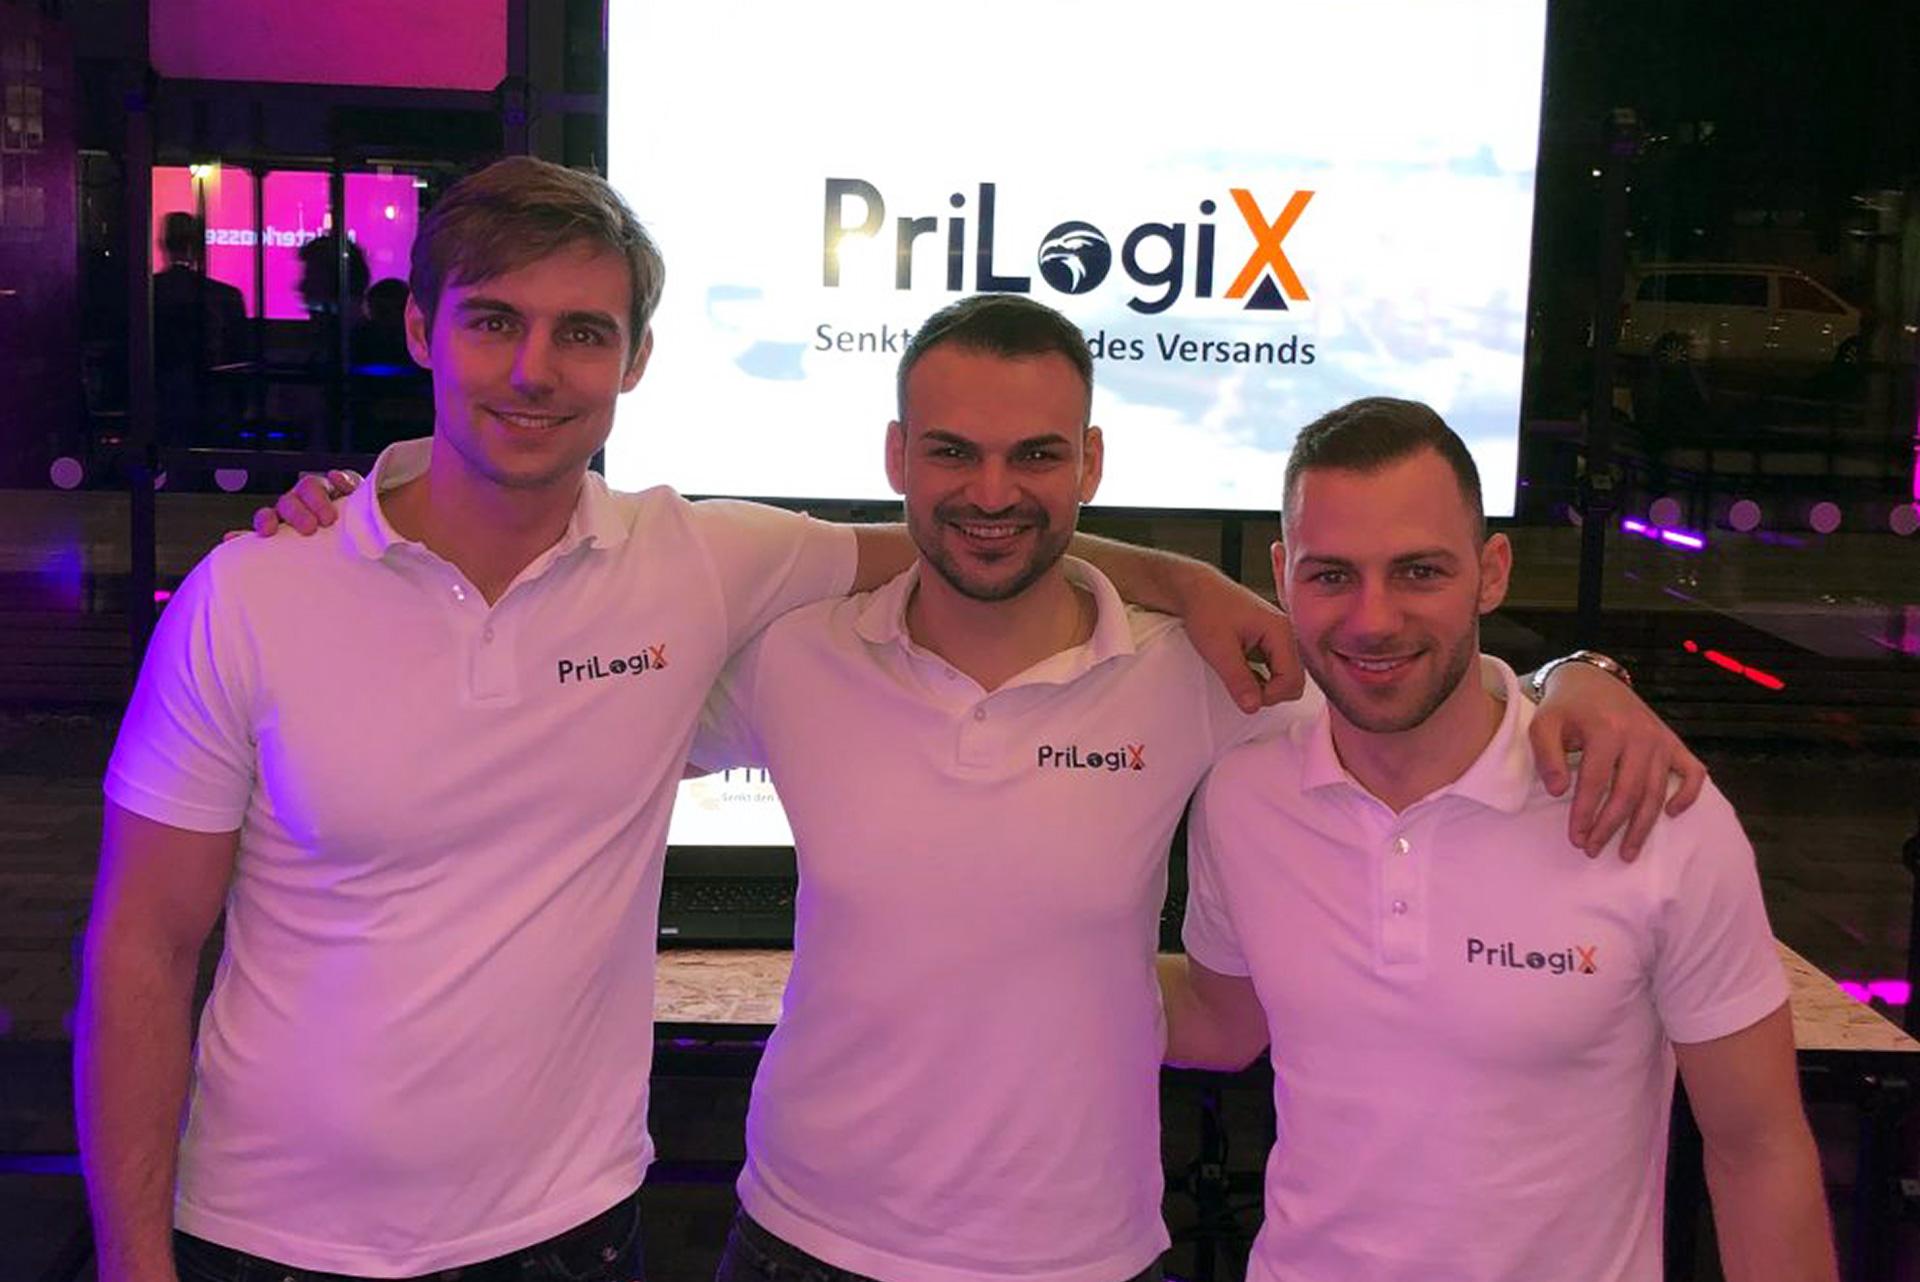 PriLogiX